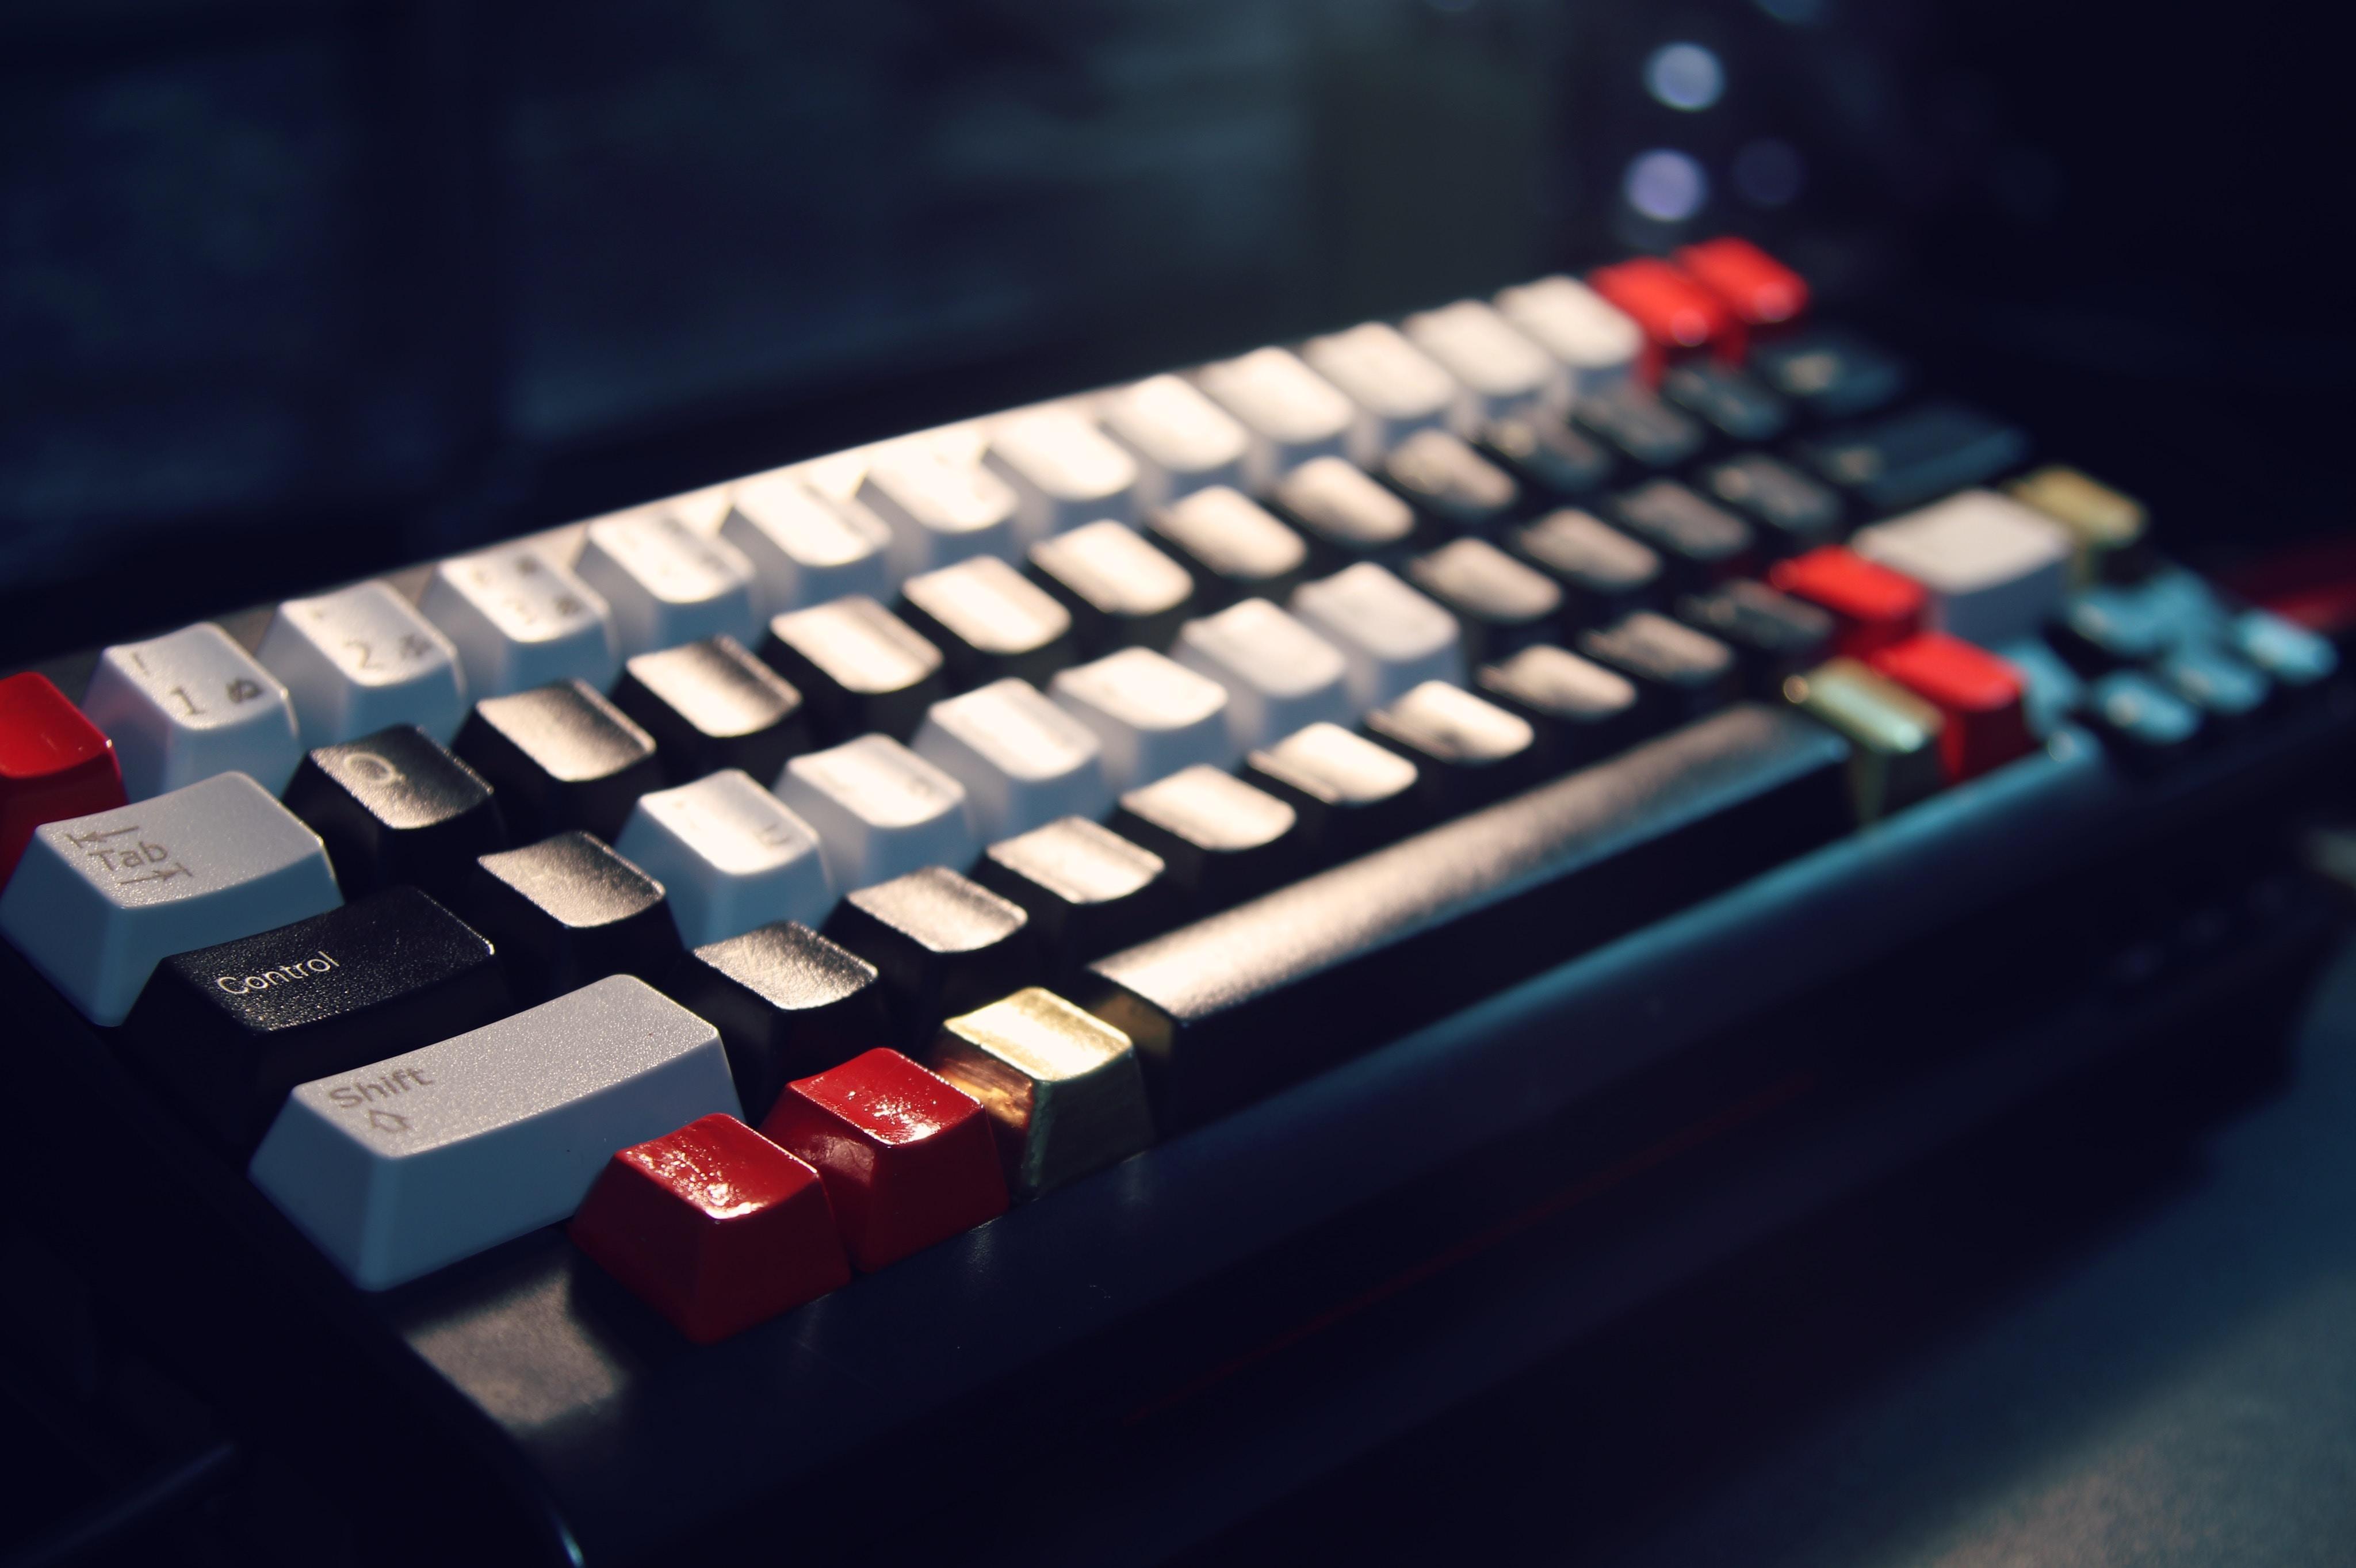 Keyboard photo by NihoNorway graphy on Unsplash